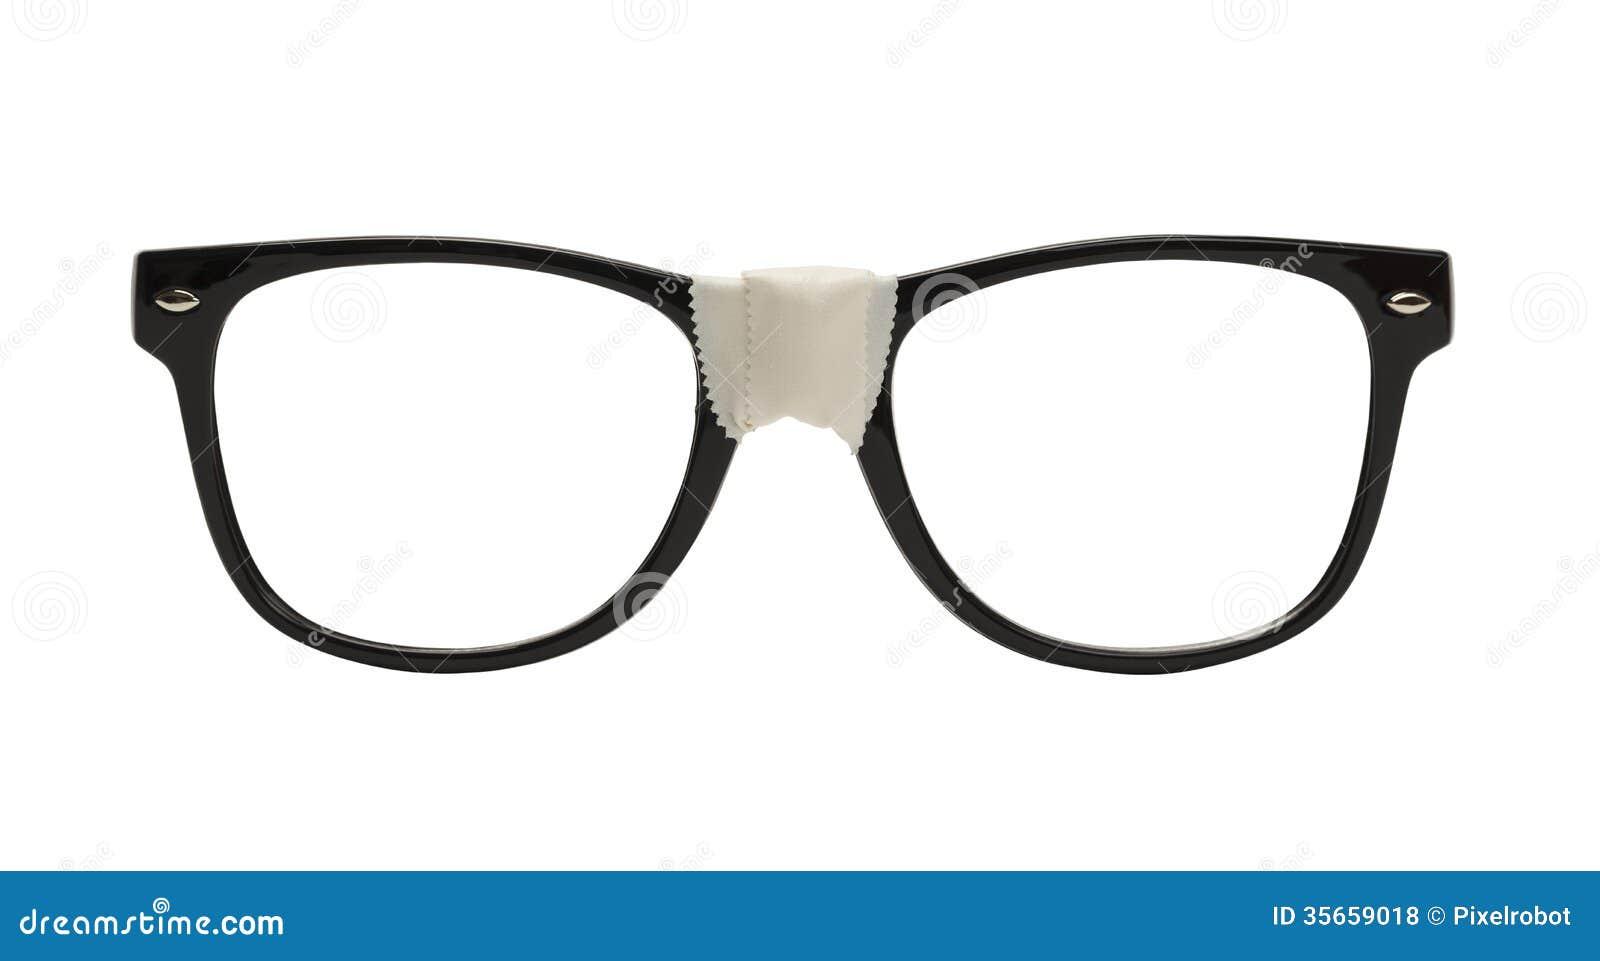 nerd glasses royalty free stock photos image 35659018. Black Bedroom Furniture Sets. Home Design Ideas